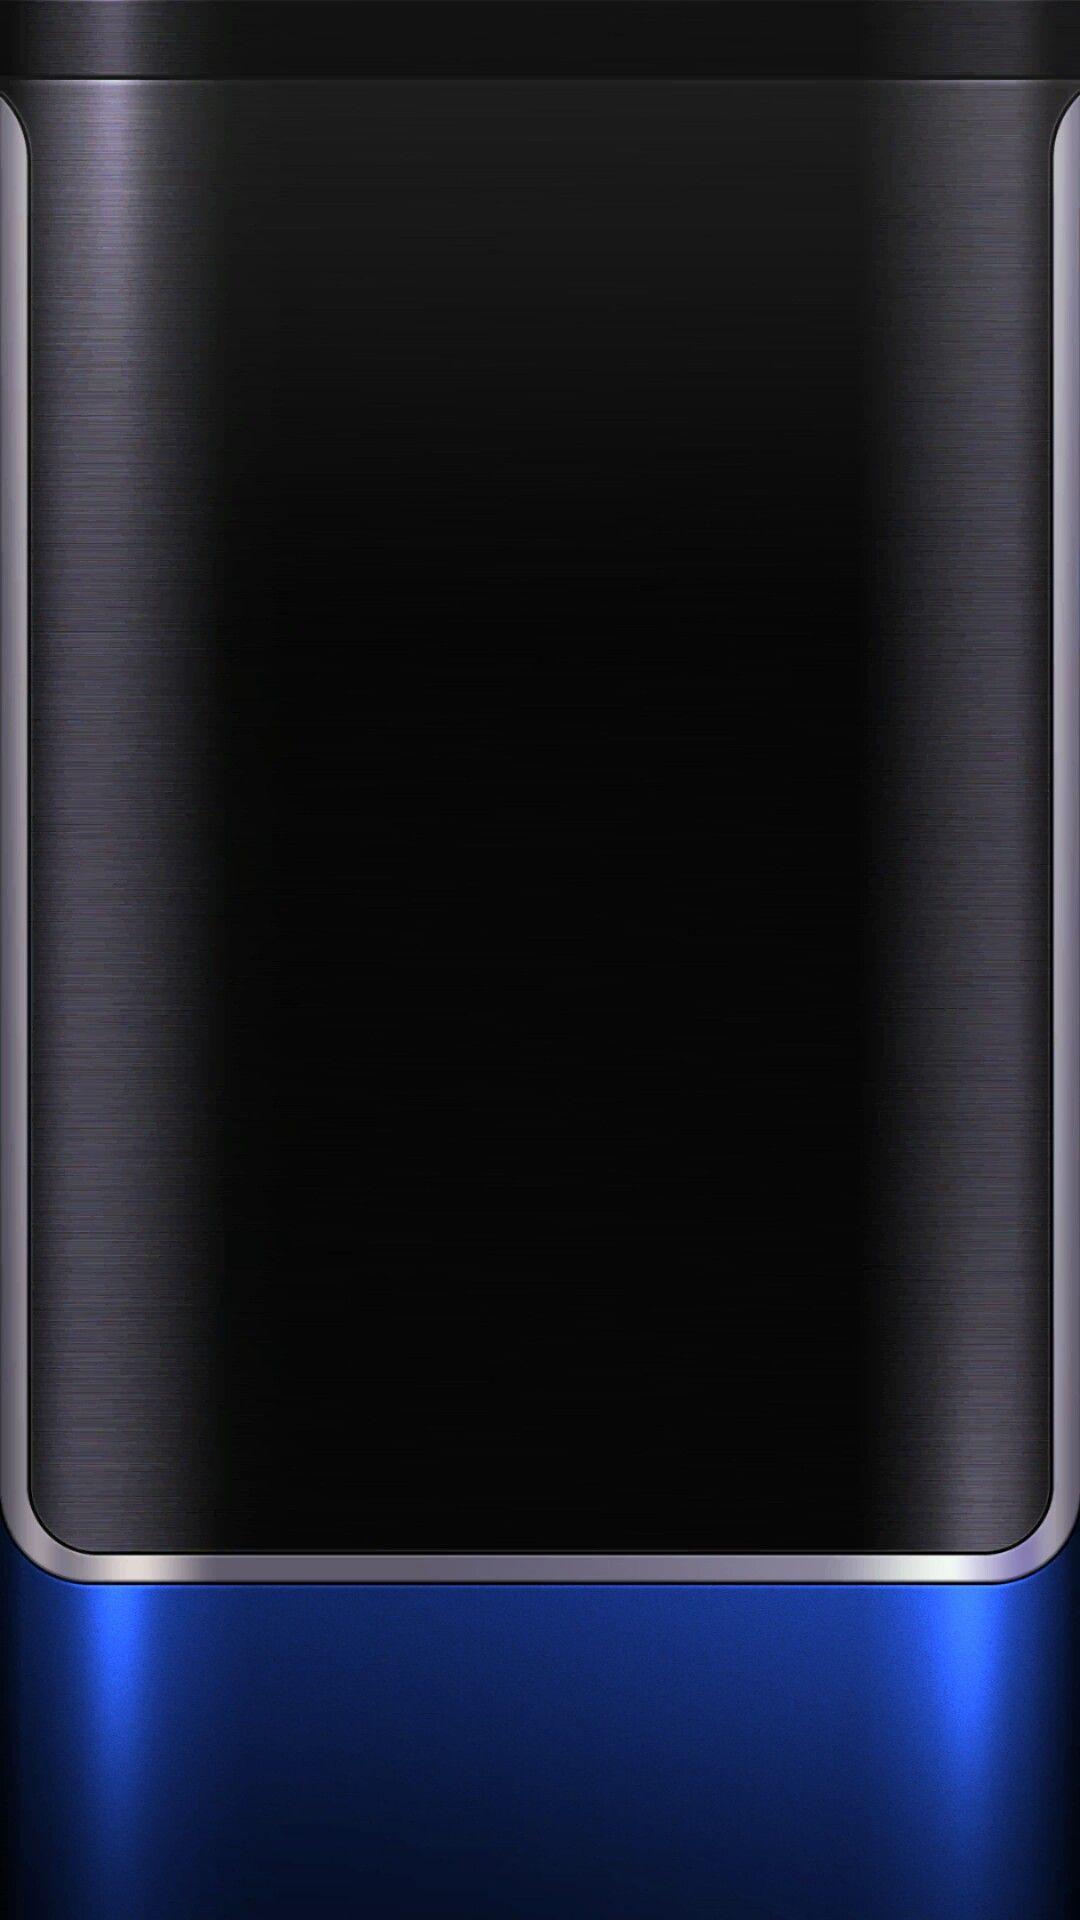 Pin By John Mccloskey On Tlo Czarne Z Niebieskim I Zielonym Background Black With Blue And Green Cellphone Wallpaper Wallpaper Edge Phone Wallpaper